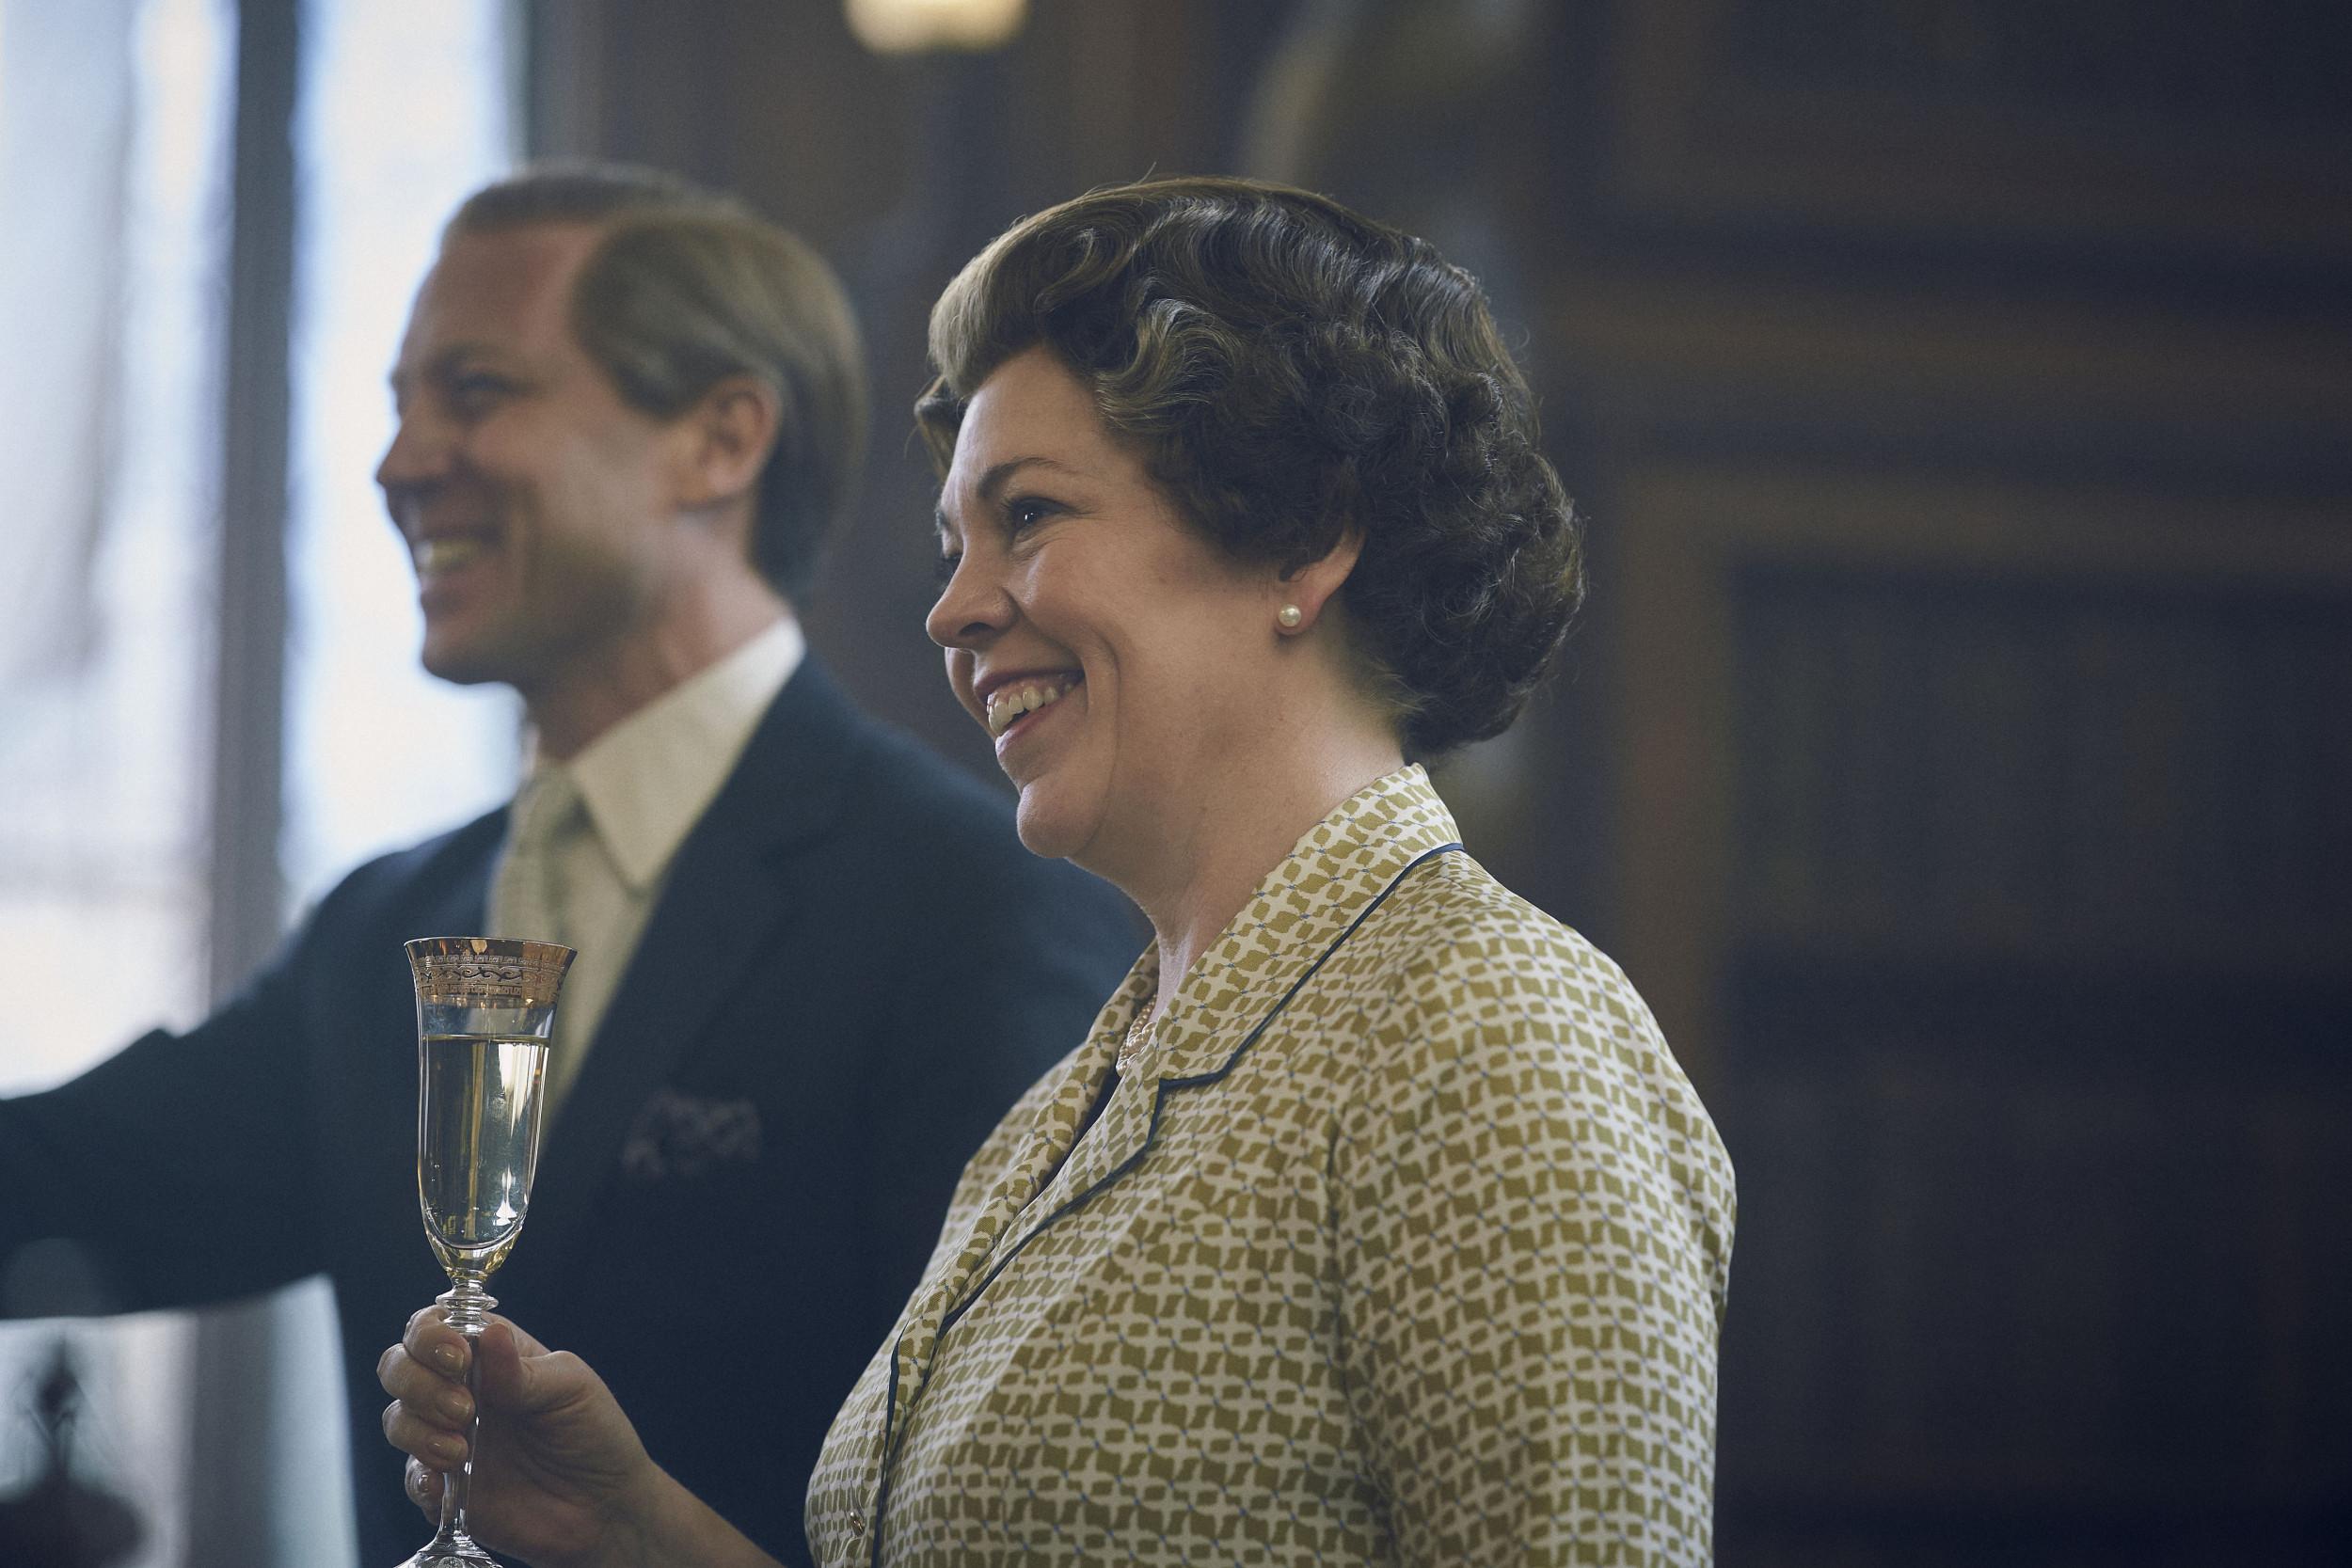 The Crown What Really Happened When Michael Fagan Broke Into Queen Elizabeth Ii S Bedroom